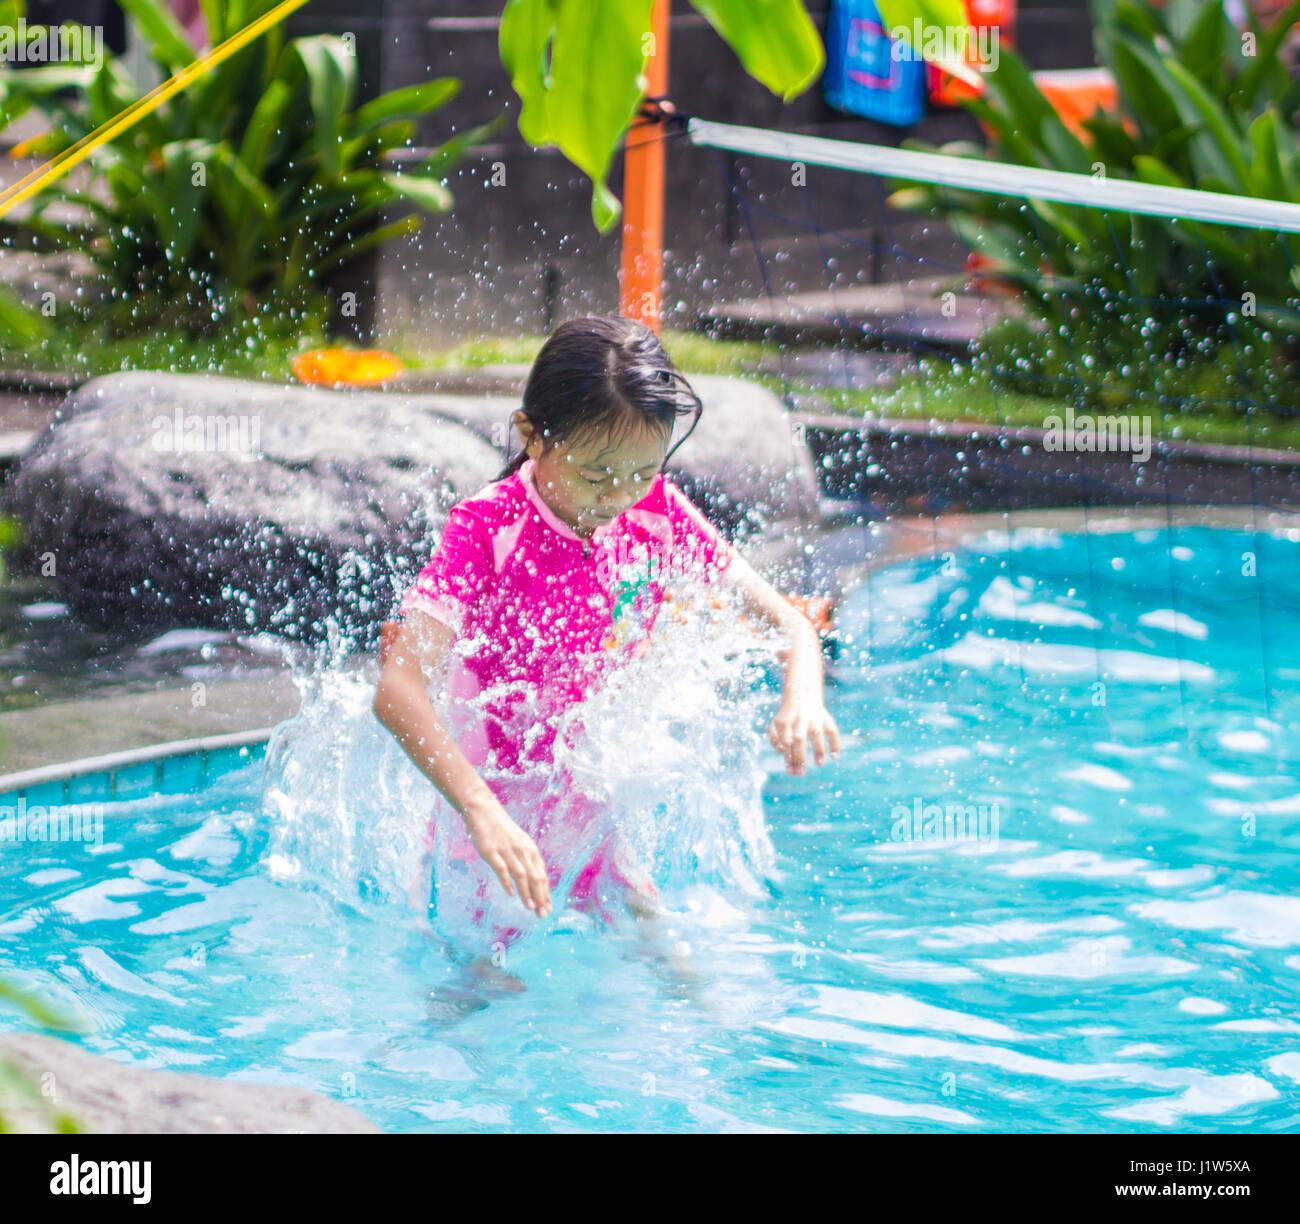 Asian Girl Jump Into Swimming Pool Stock Photo Royalty